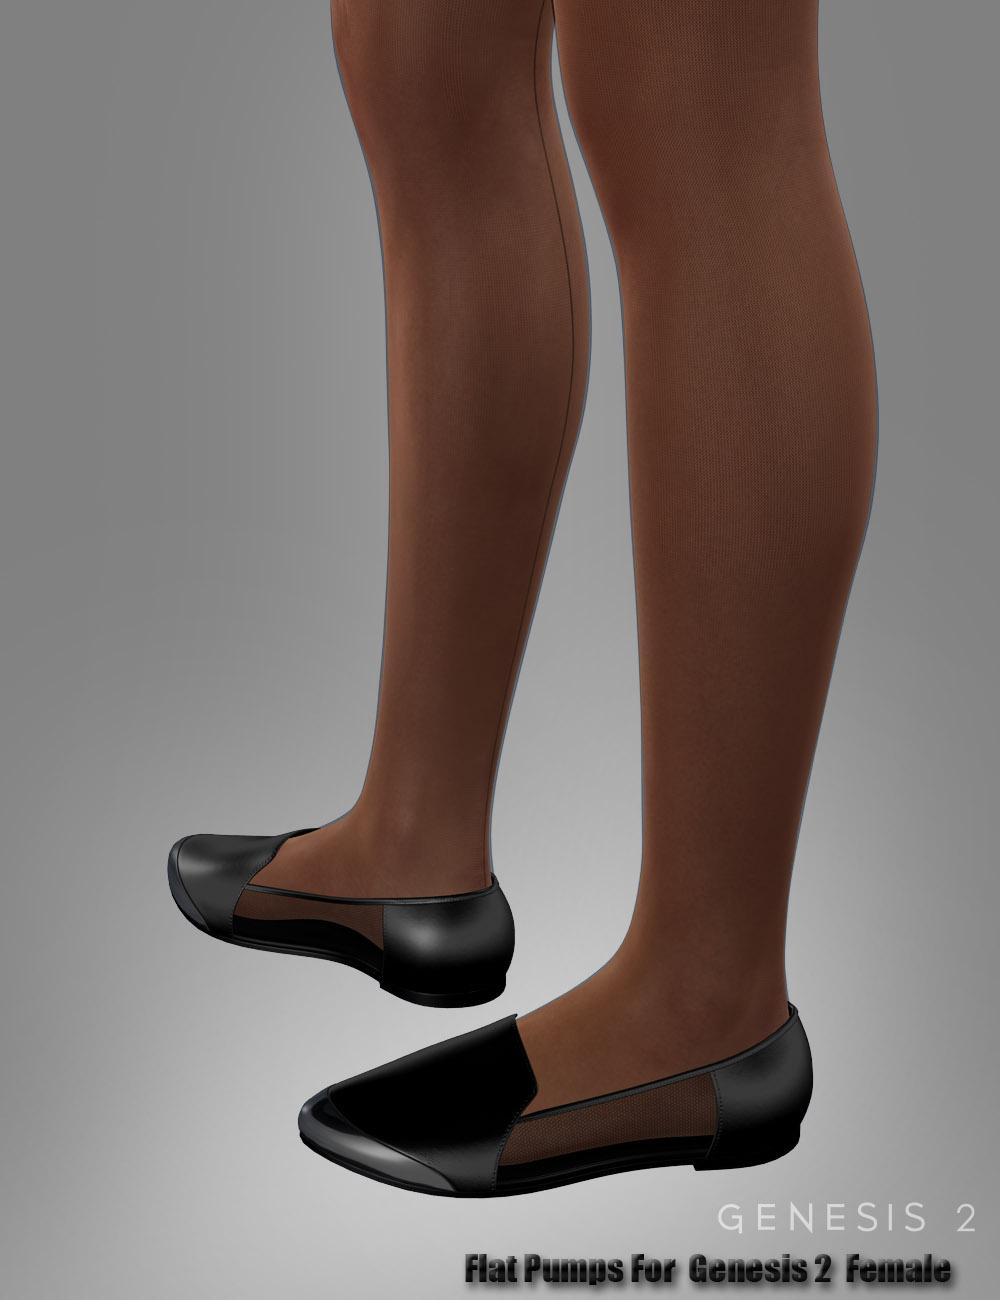 Flat Pumps For Genesis 2 Female(s) by: dx30, 3D Models by Daz 3D